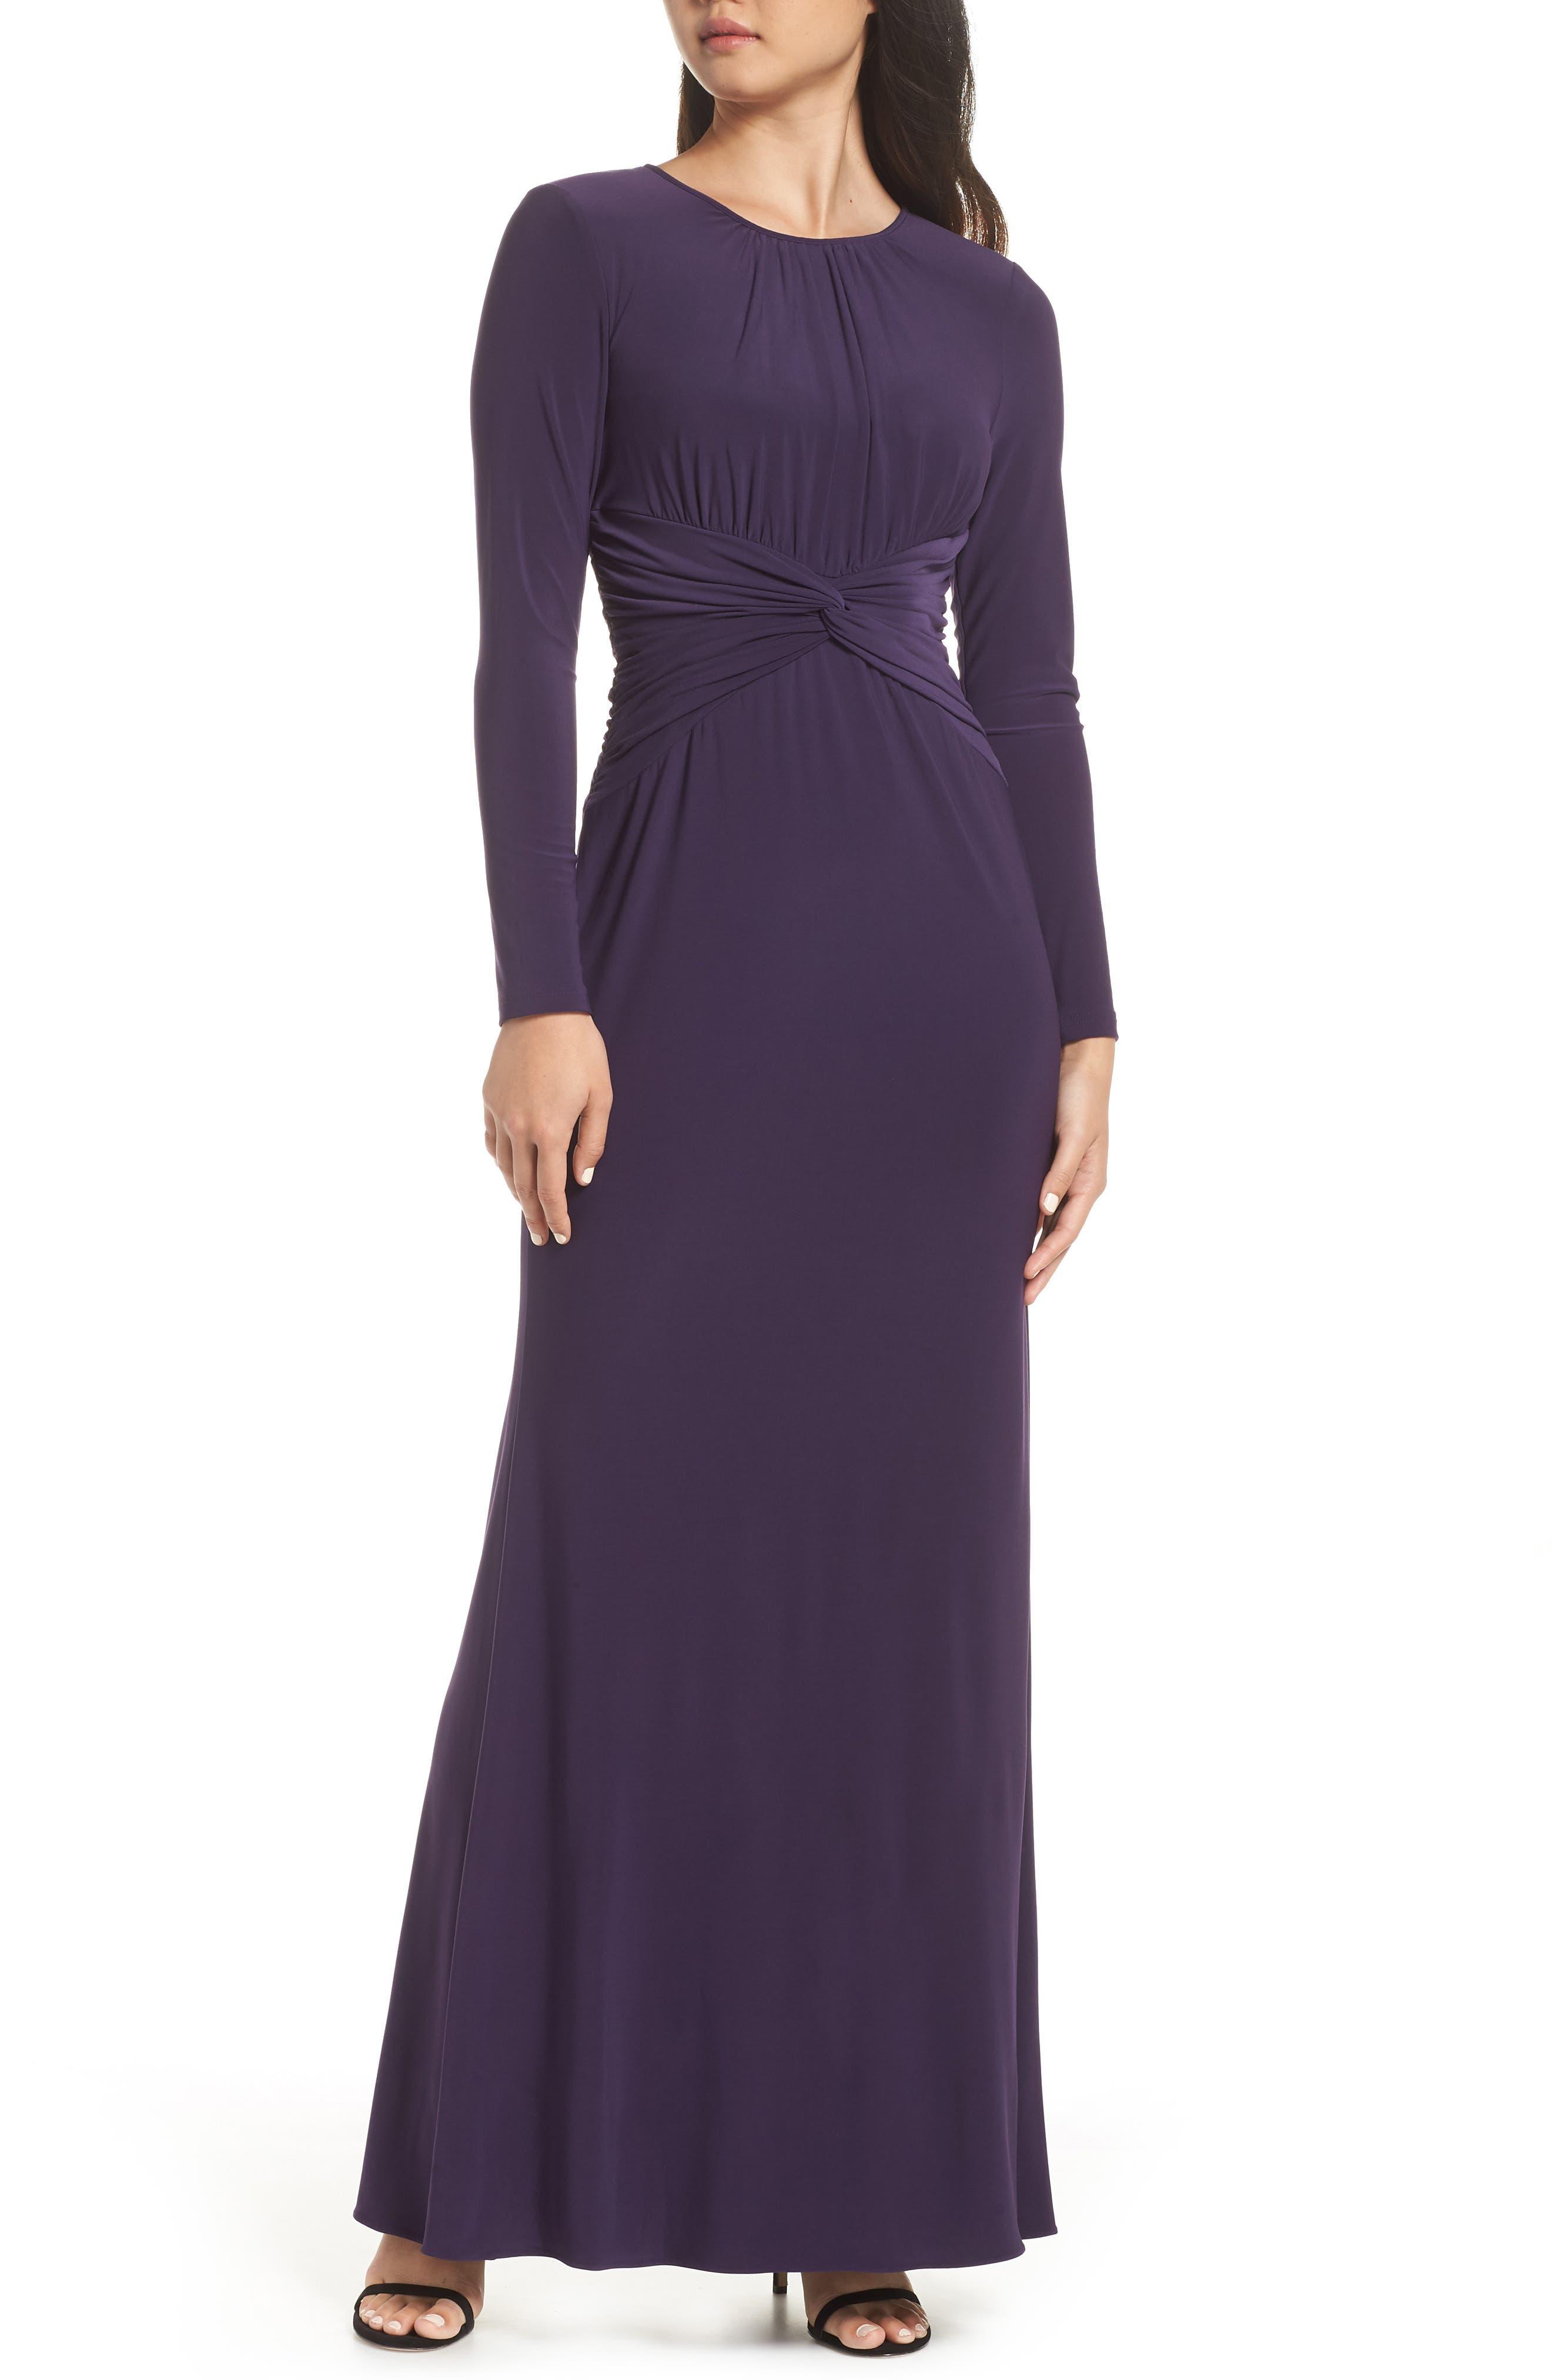 ADRIANNA PAPELL Twist Waist Knit Dress, Main, color, 501